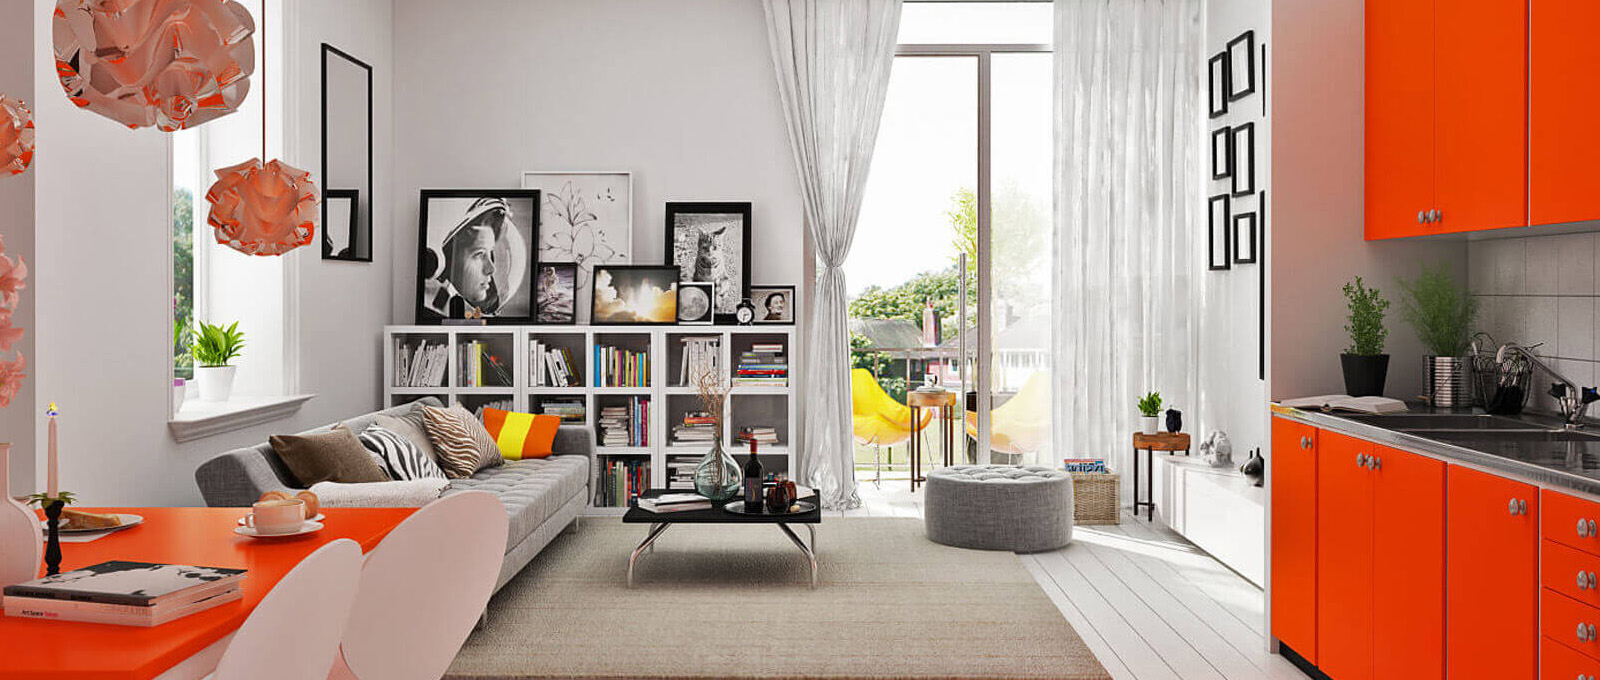 Agenzie immobiliari real estate firenze - Casa it valutazione immobili ...